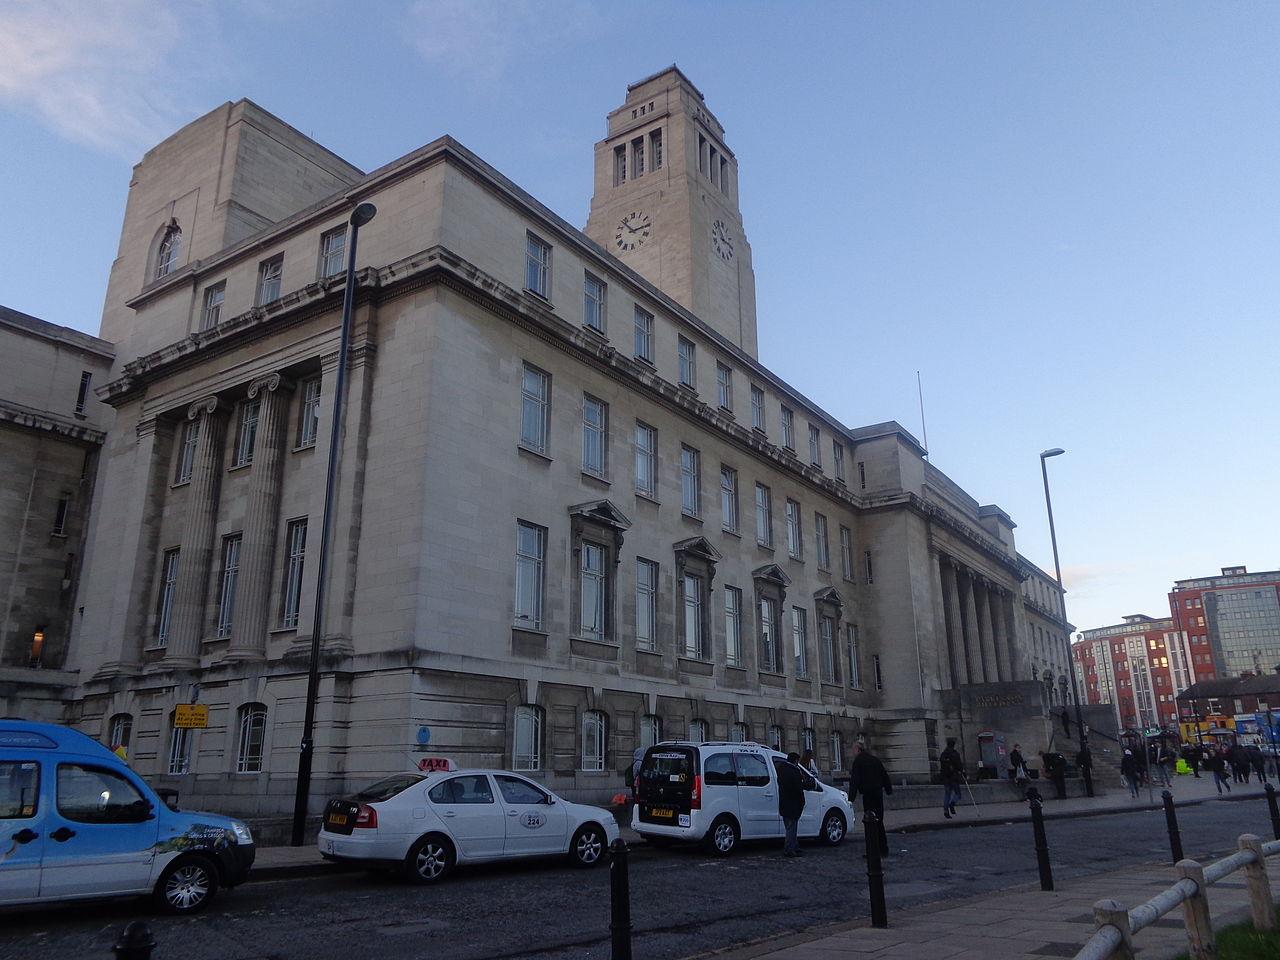 1938-1951Parkinson_Building,_University_of_Leeds_(5th_December_2014).JPG